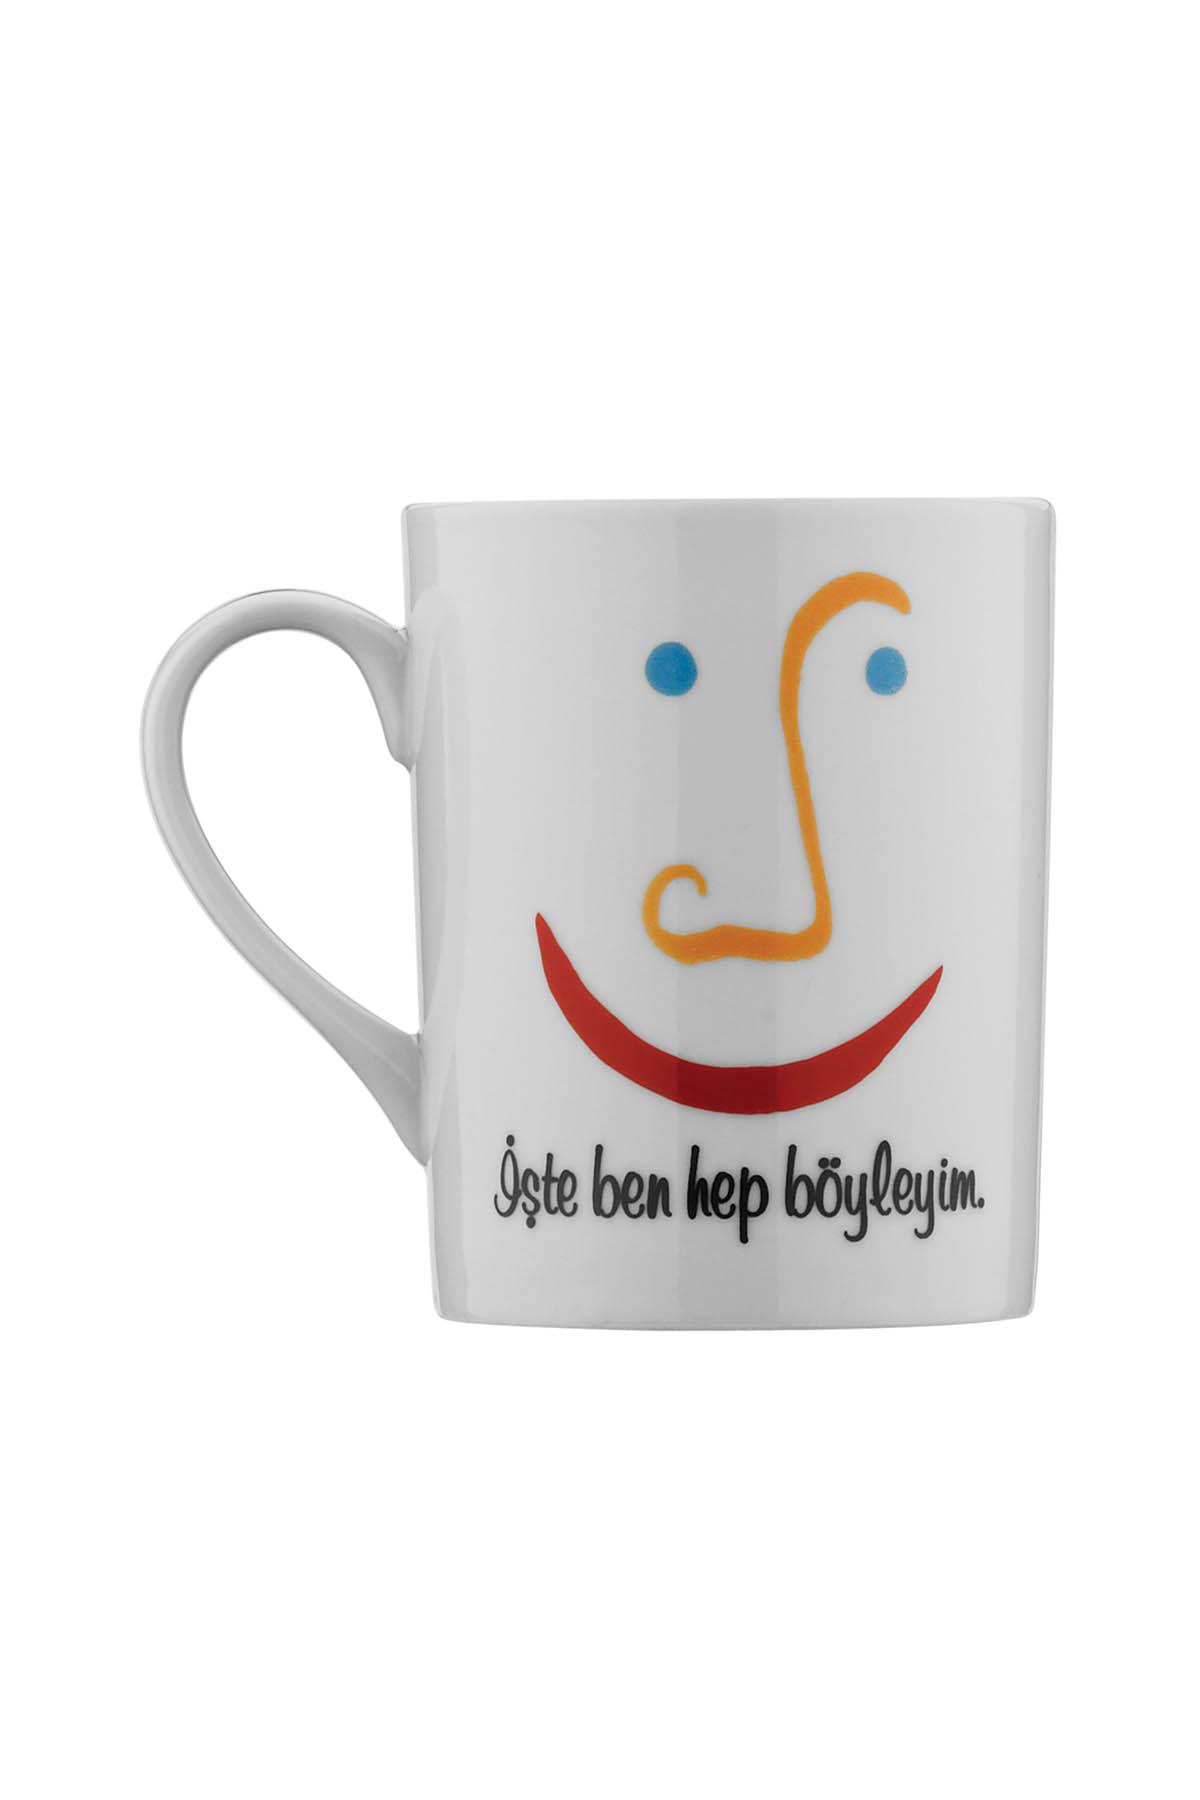 Kütahya Porselen - Kütahya Porselen Mug Bardak 107591